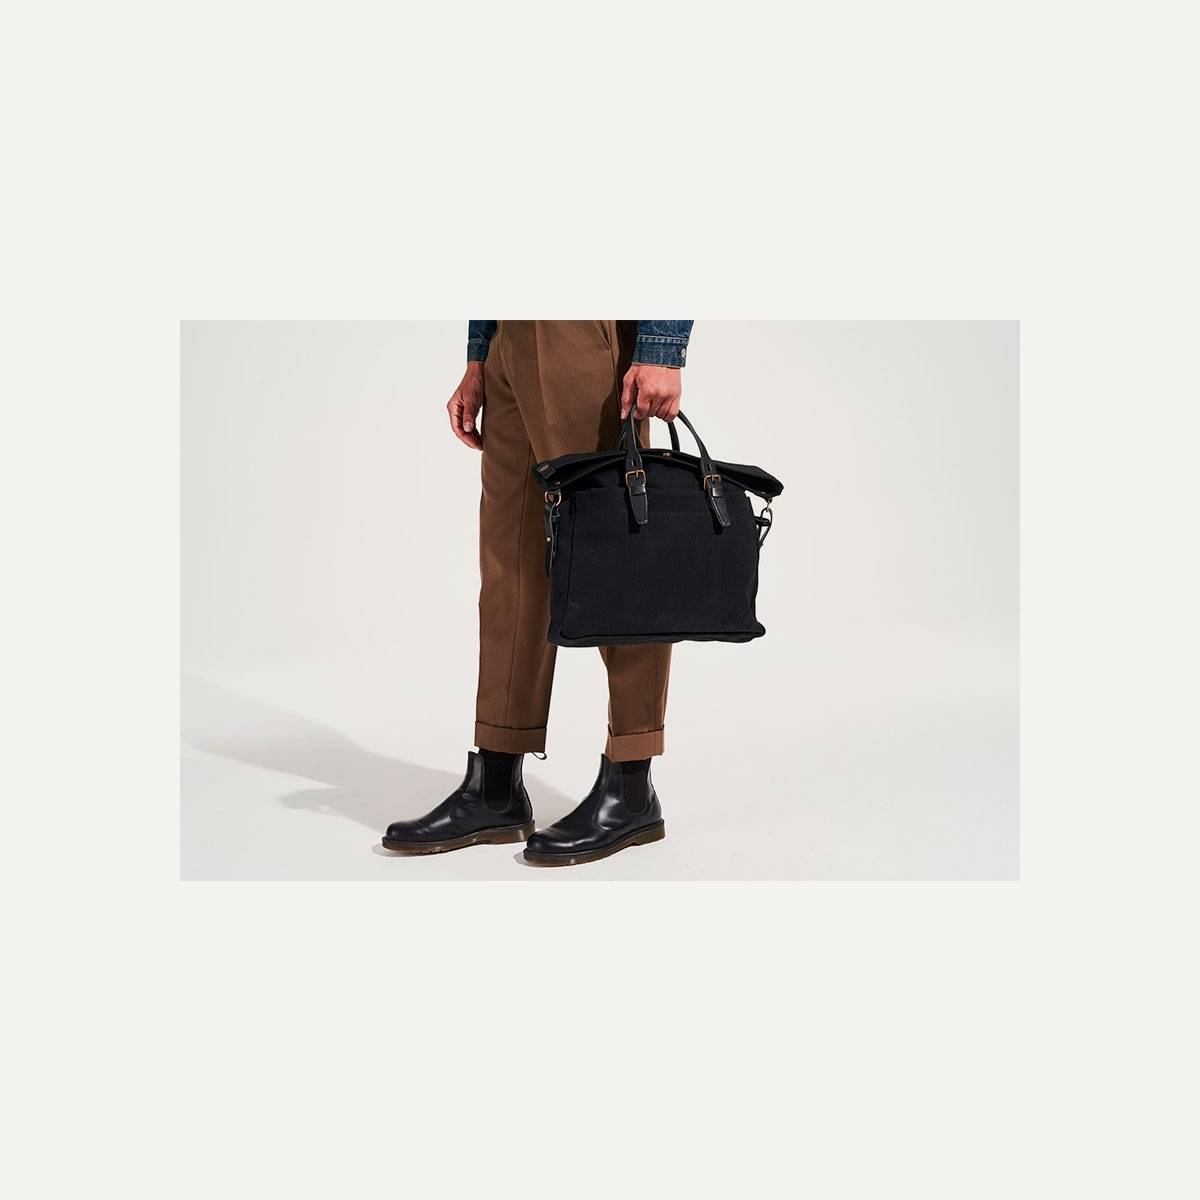 Remix business bag - Regentex Orange (image n°11)